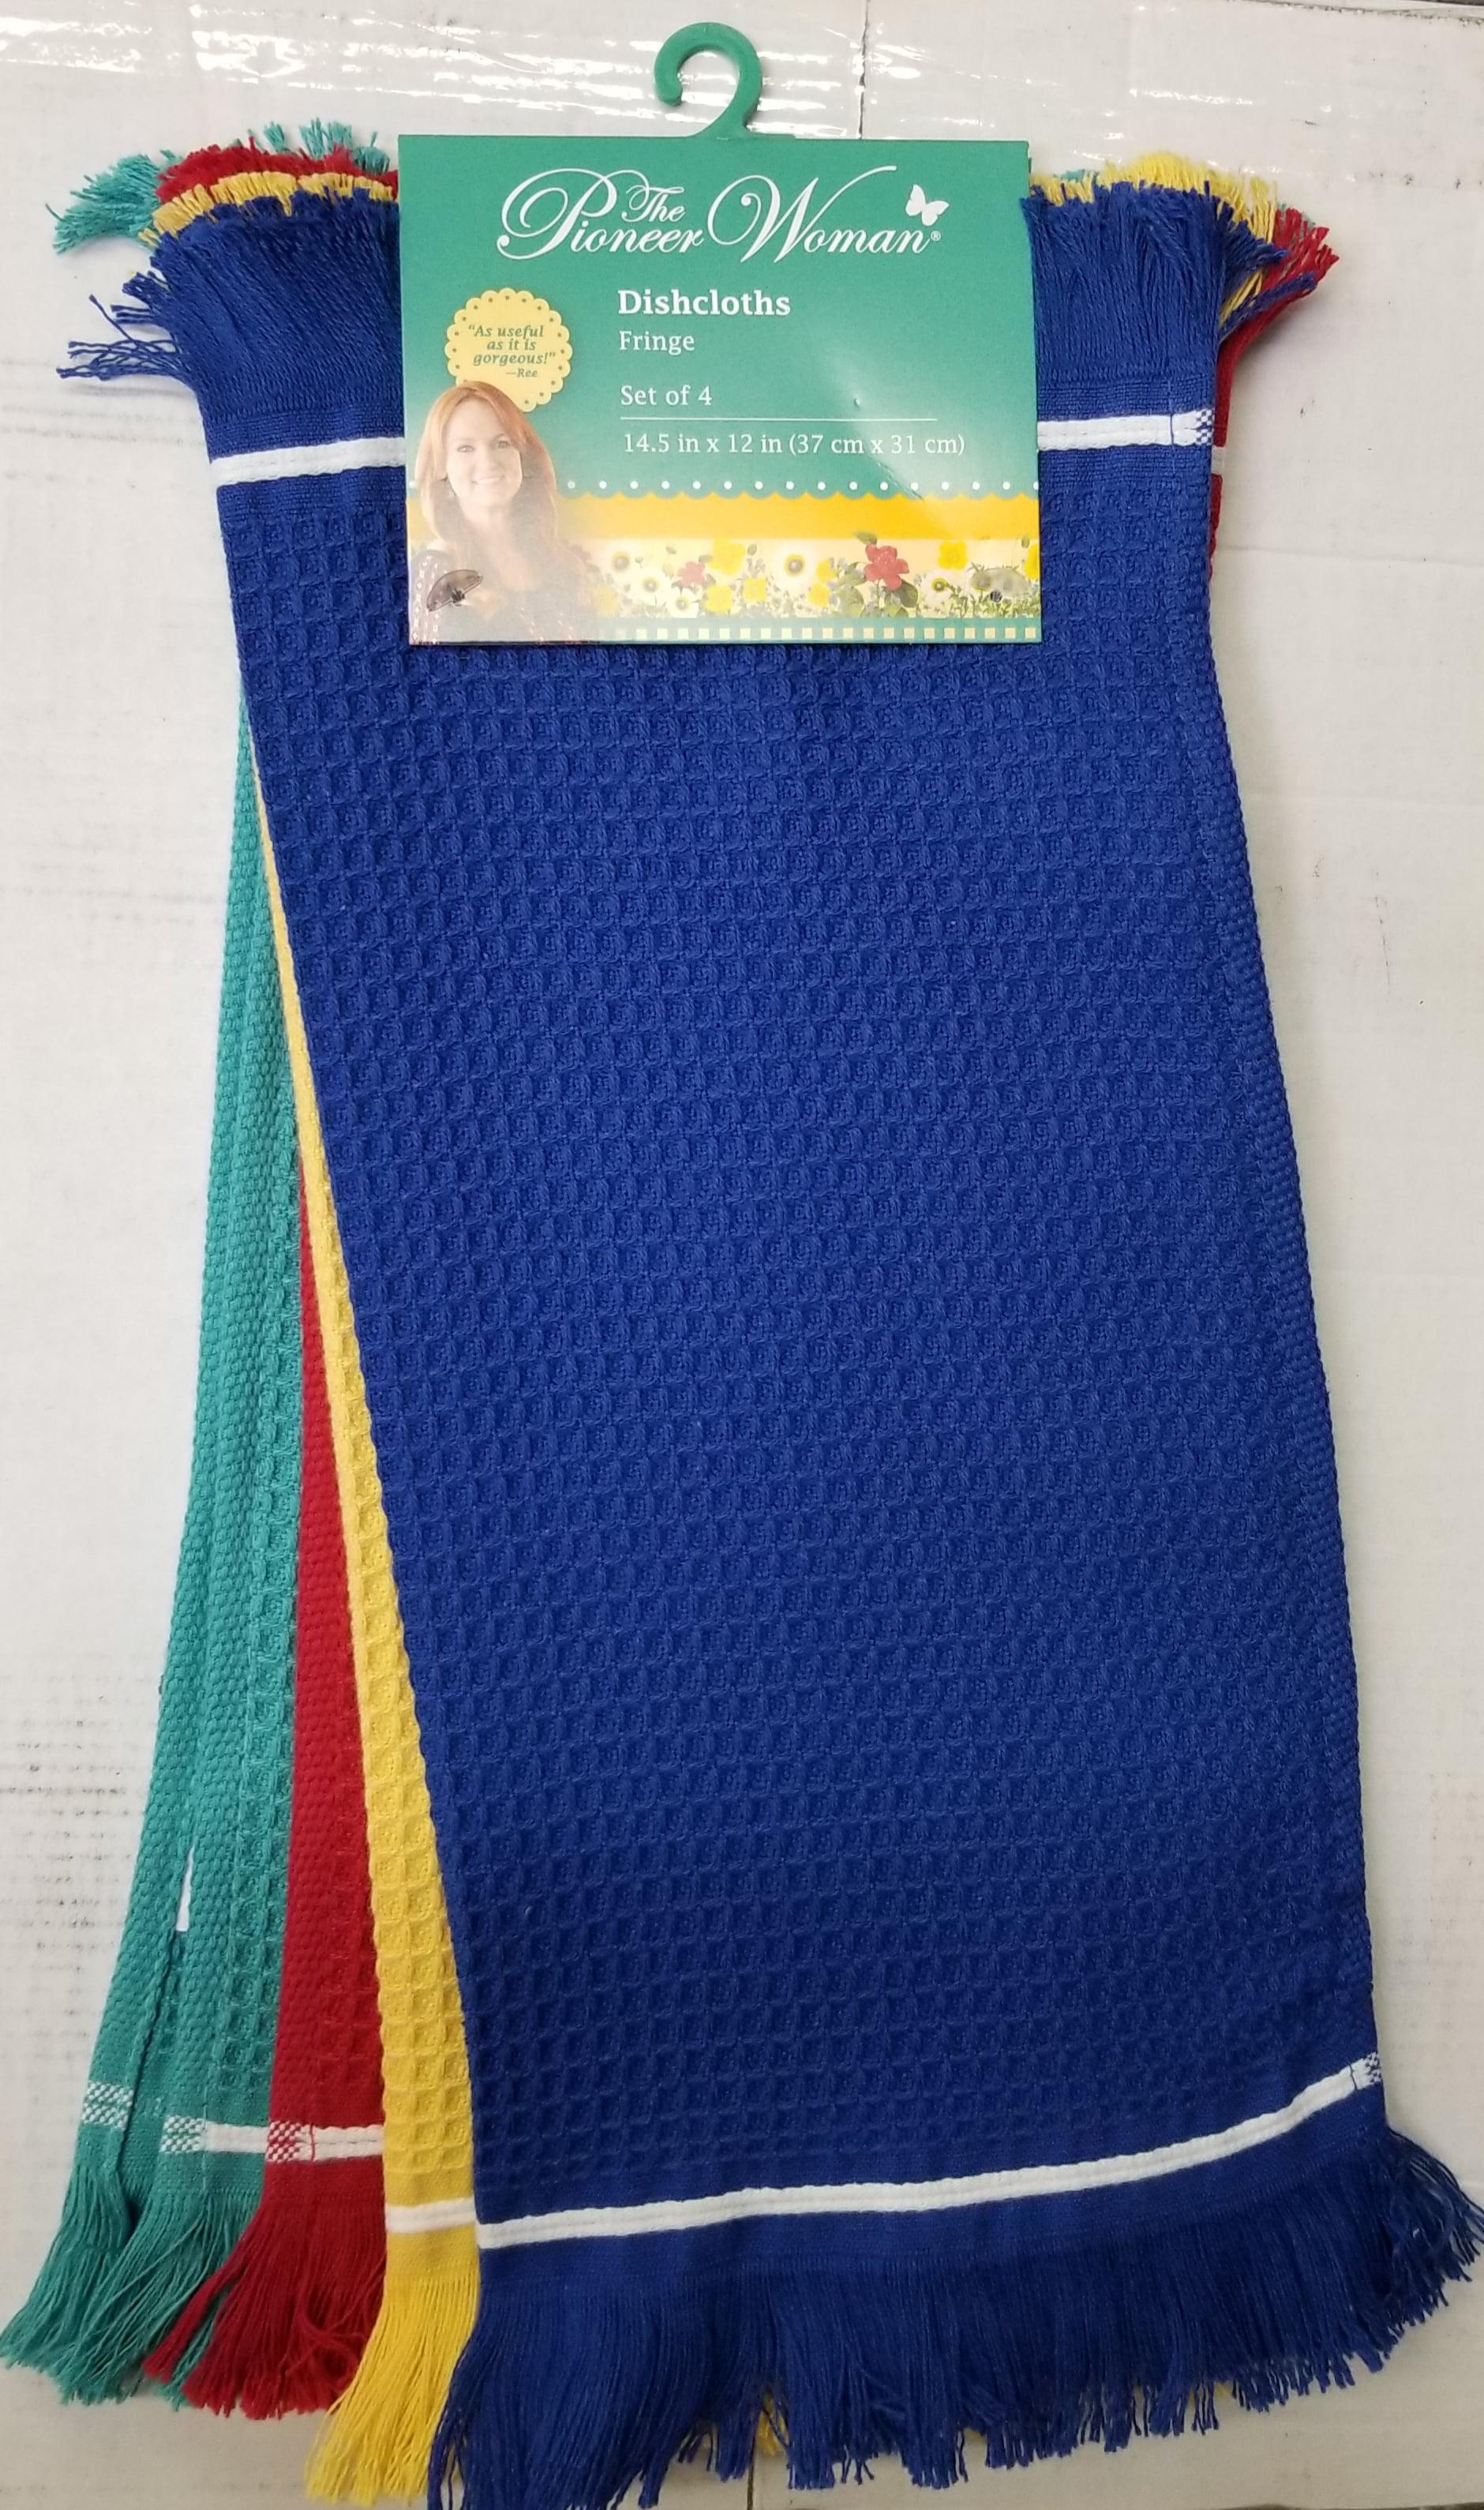 Dish Rags Crocheted Dishcloths Dish Cloths-Buyers Choice 7 Colors Wash Cloths